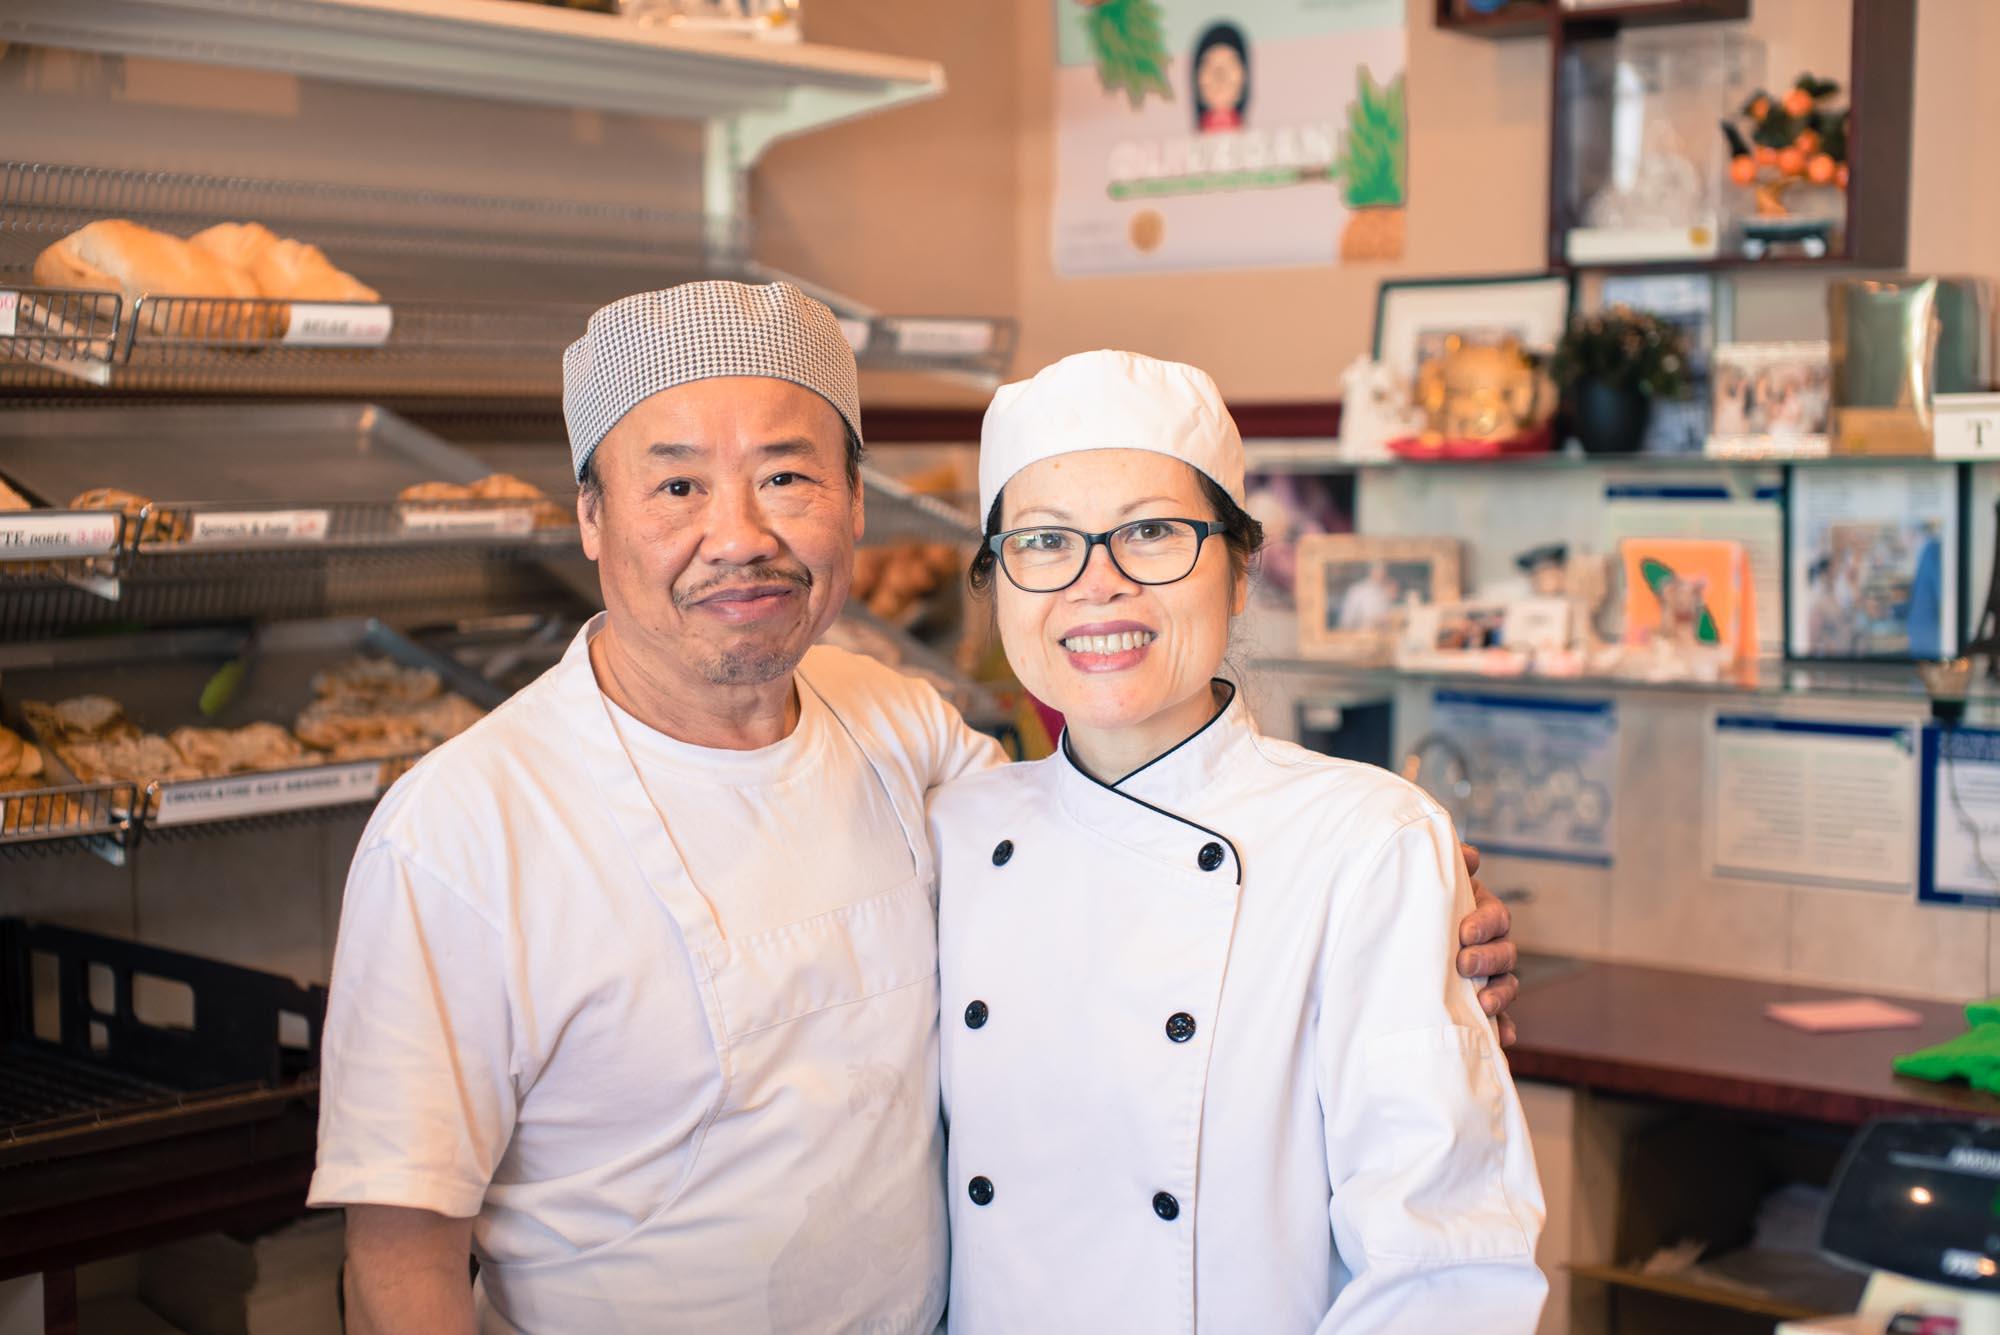 Équipe rue Watters Eam Yieng and Siu Senh